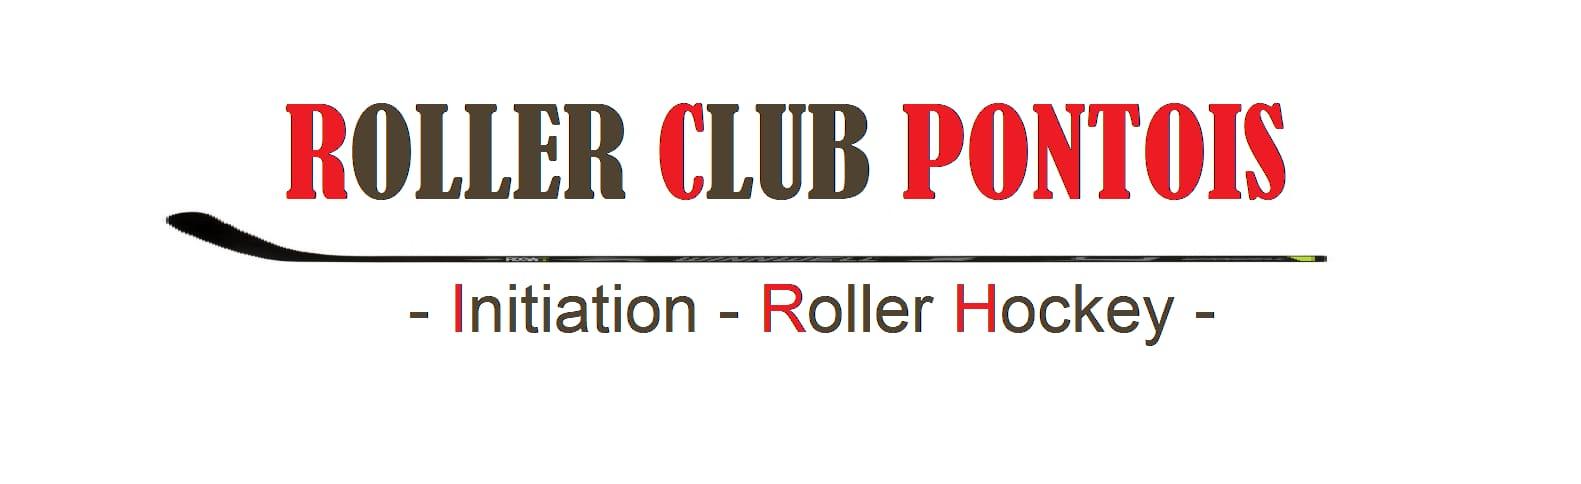 Roller Club Pontois